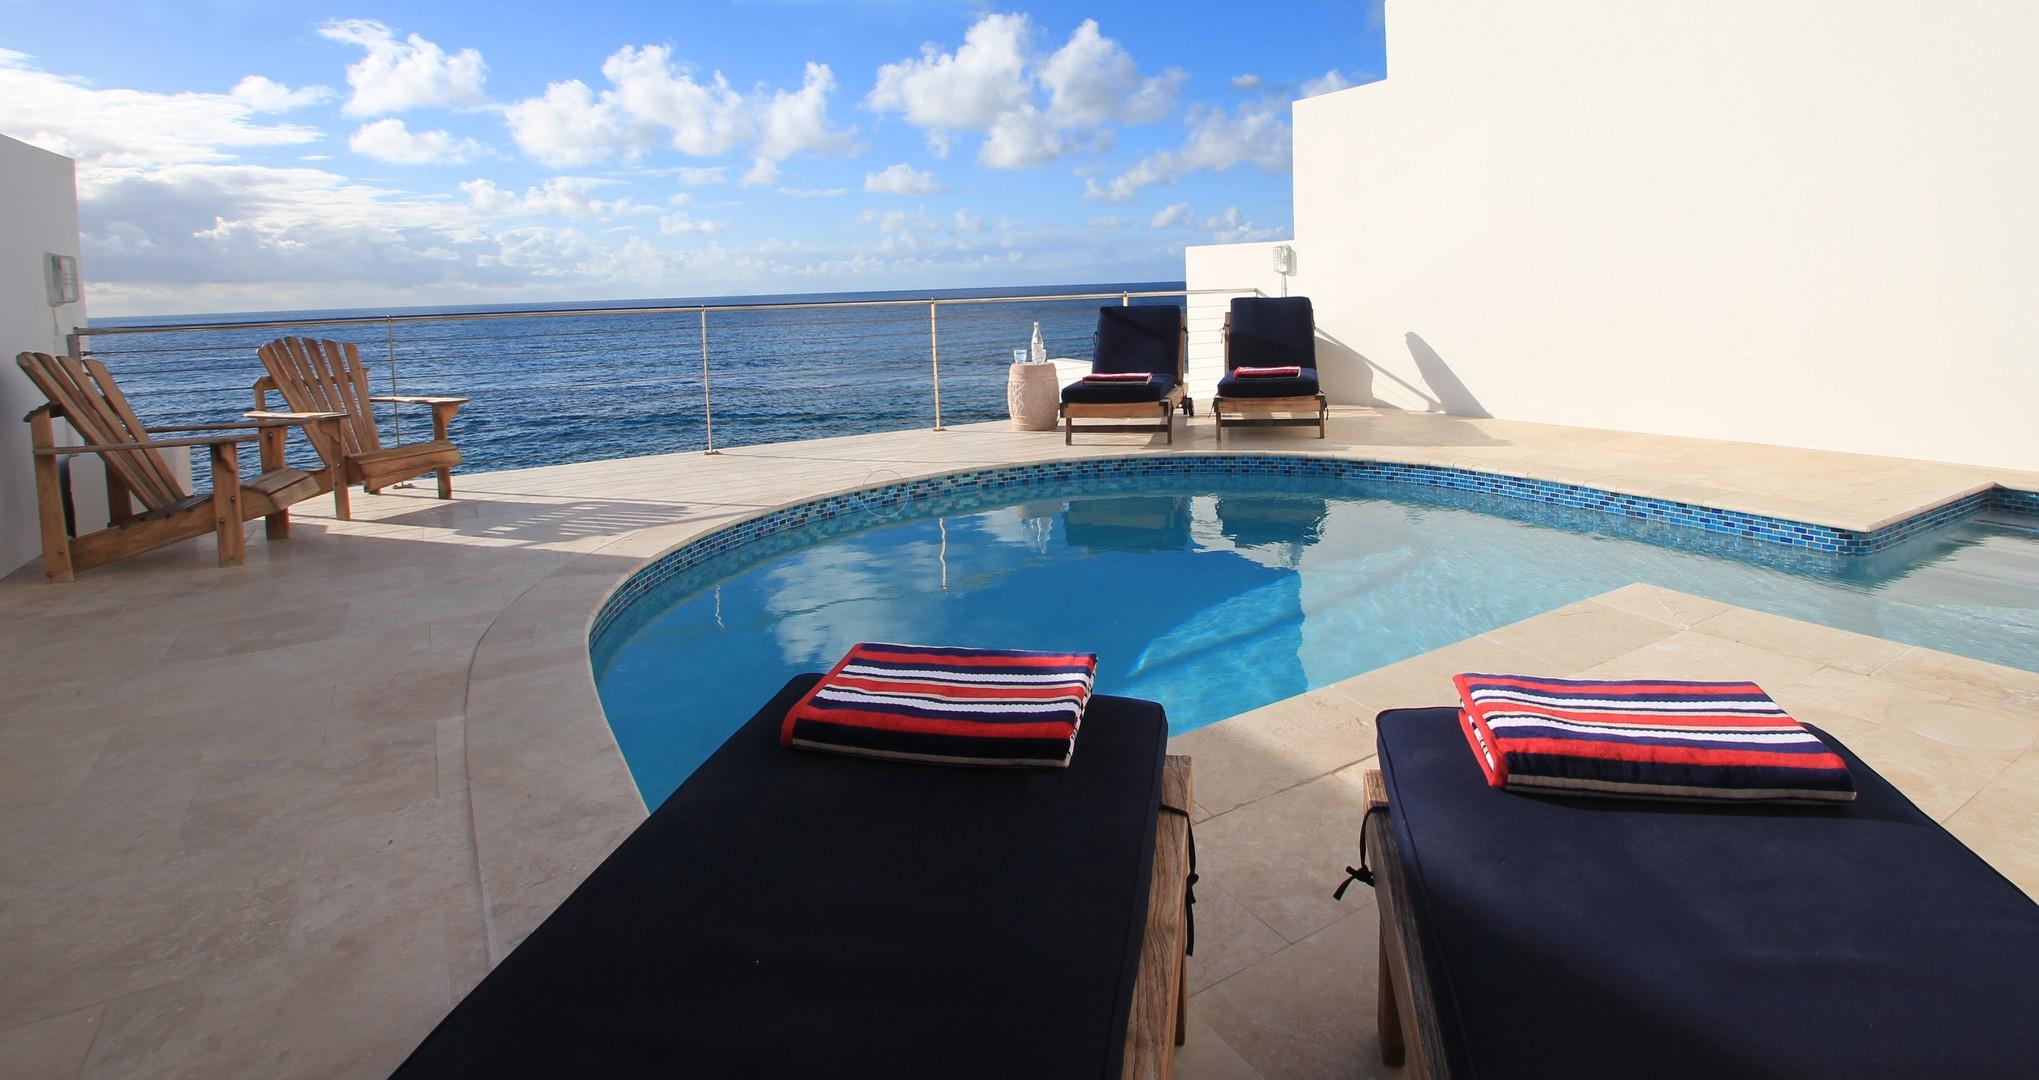 Villa Velaire Pool Deck